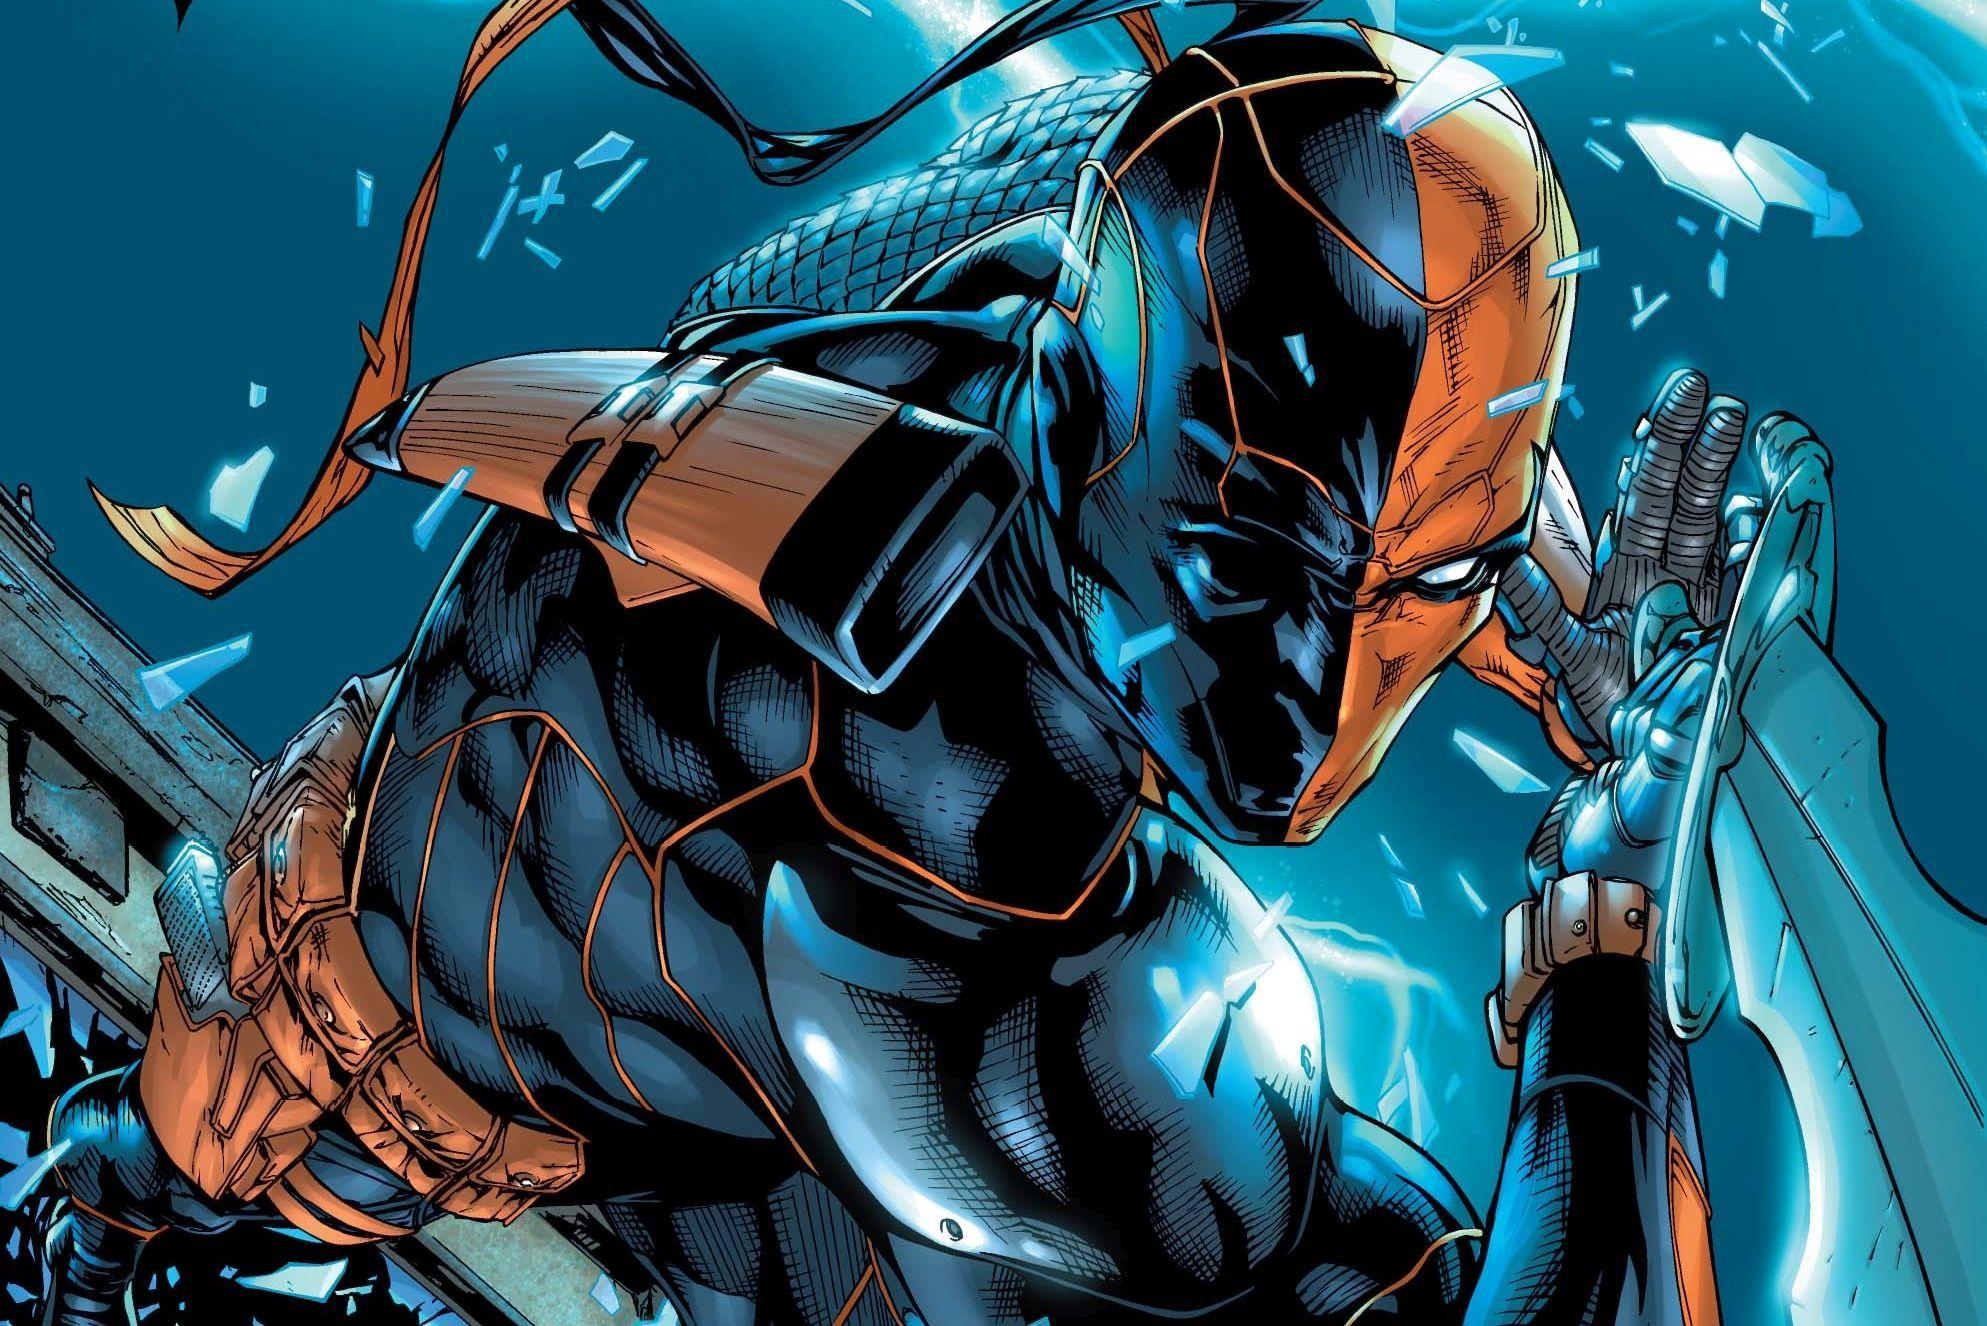 Deathstroke Dc Comics Artwork Hd Superheroes Wallpapers Hd